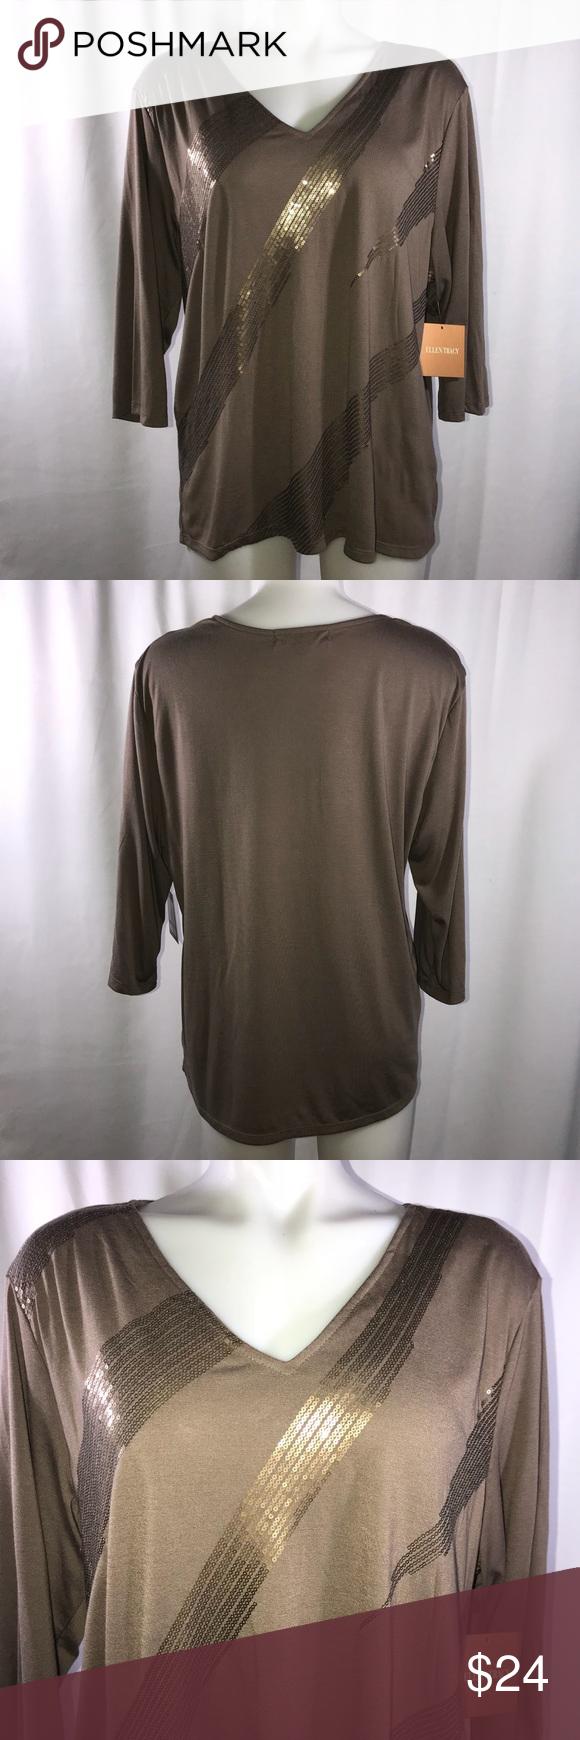 Ellen Tracy Sequin Blouse (Q) V-neck Sparkly sequin Taupe color. Brand